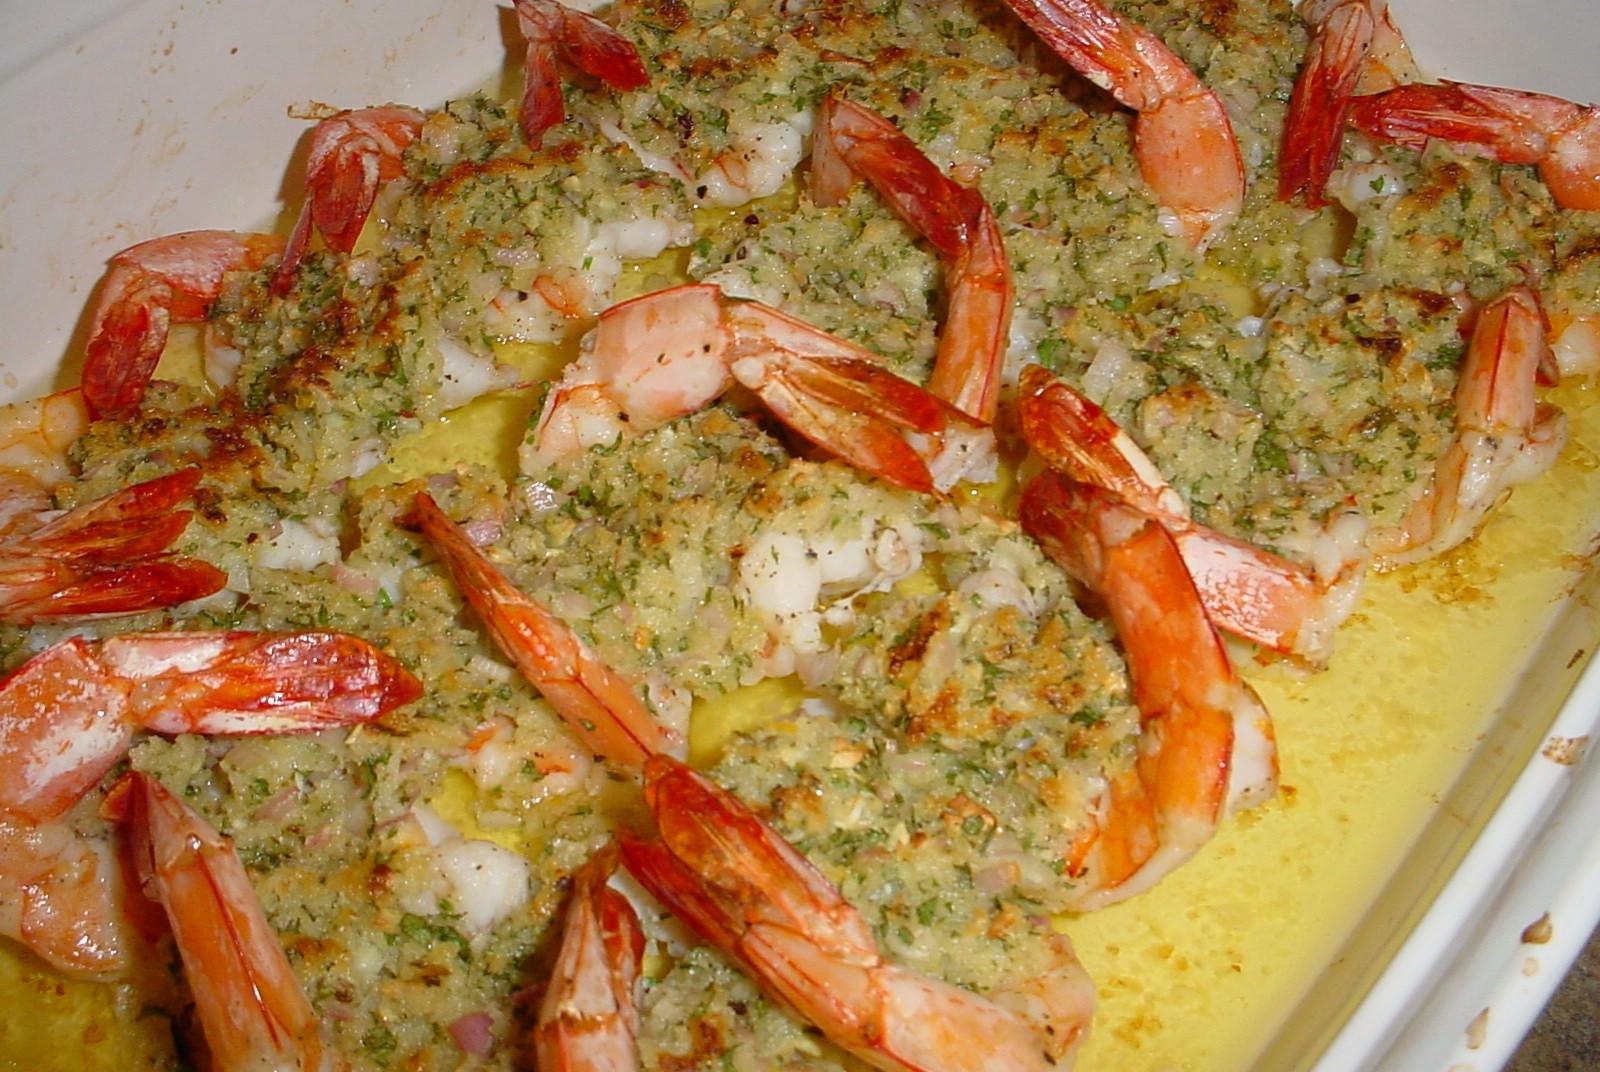 Kearby's Kitchen: Baked Shrimp Scampi